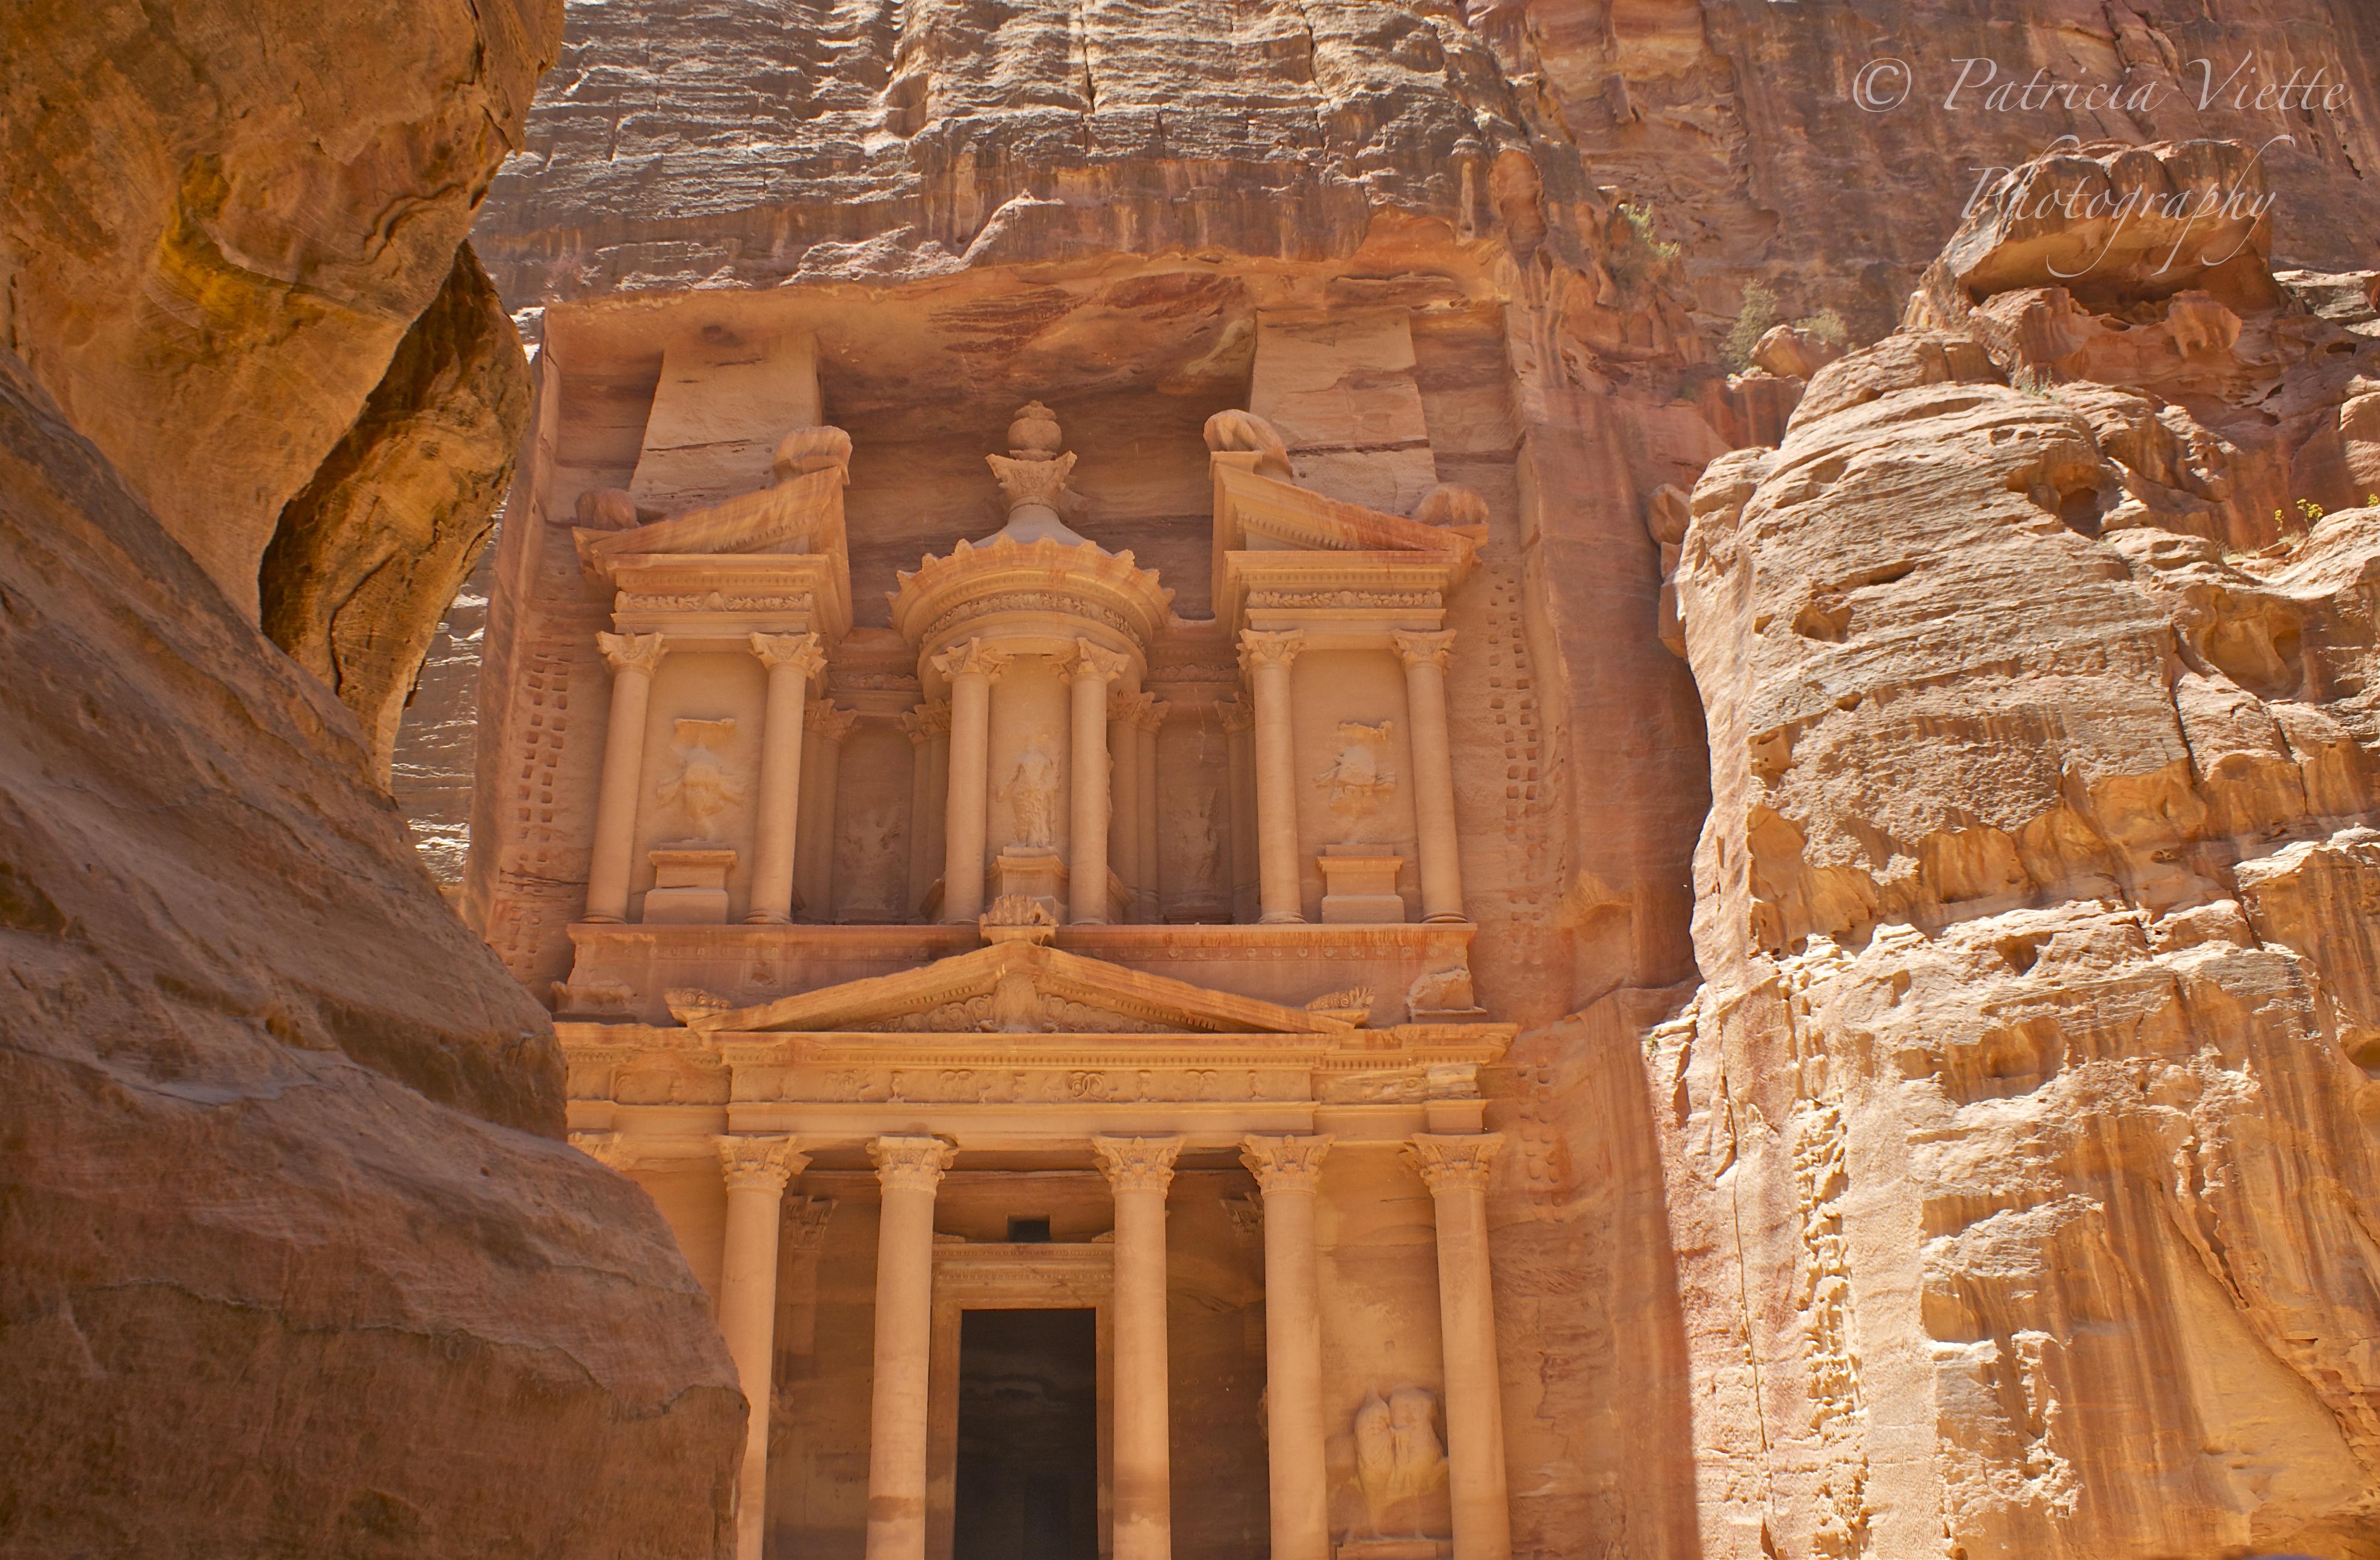 Petra, the historical city of Jordan